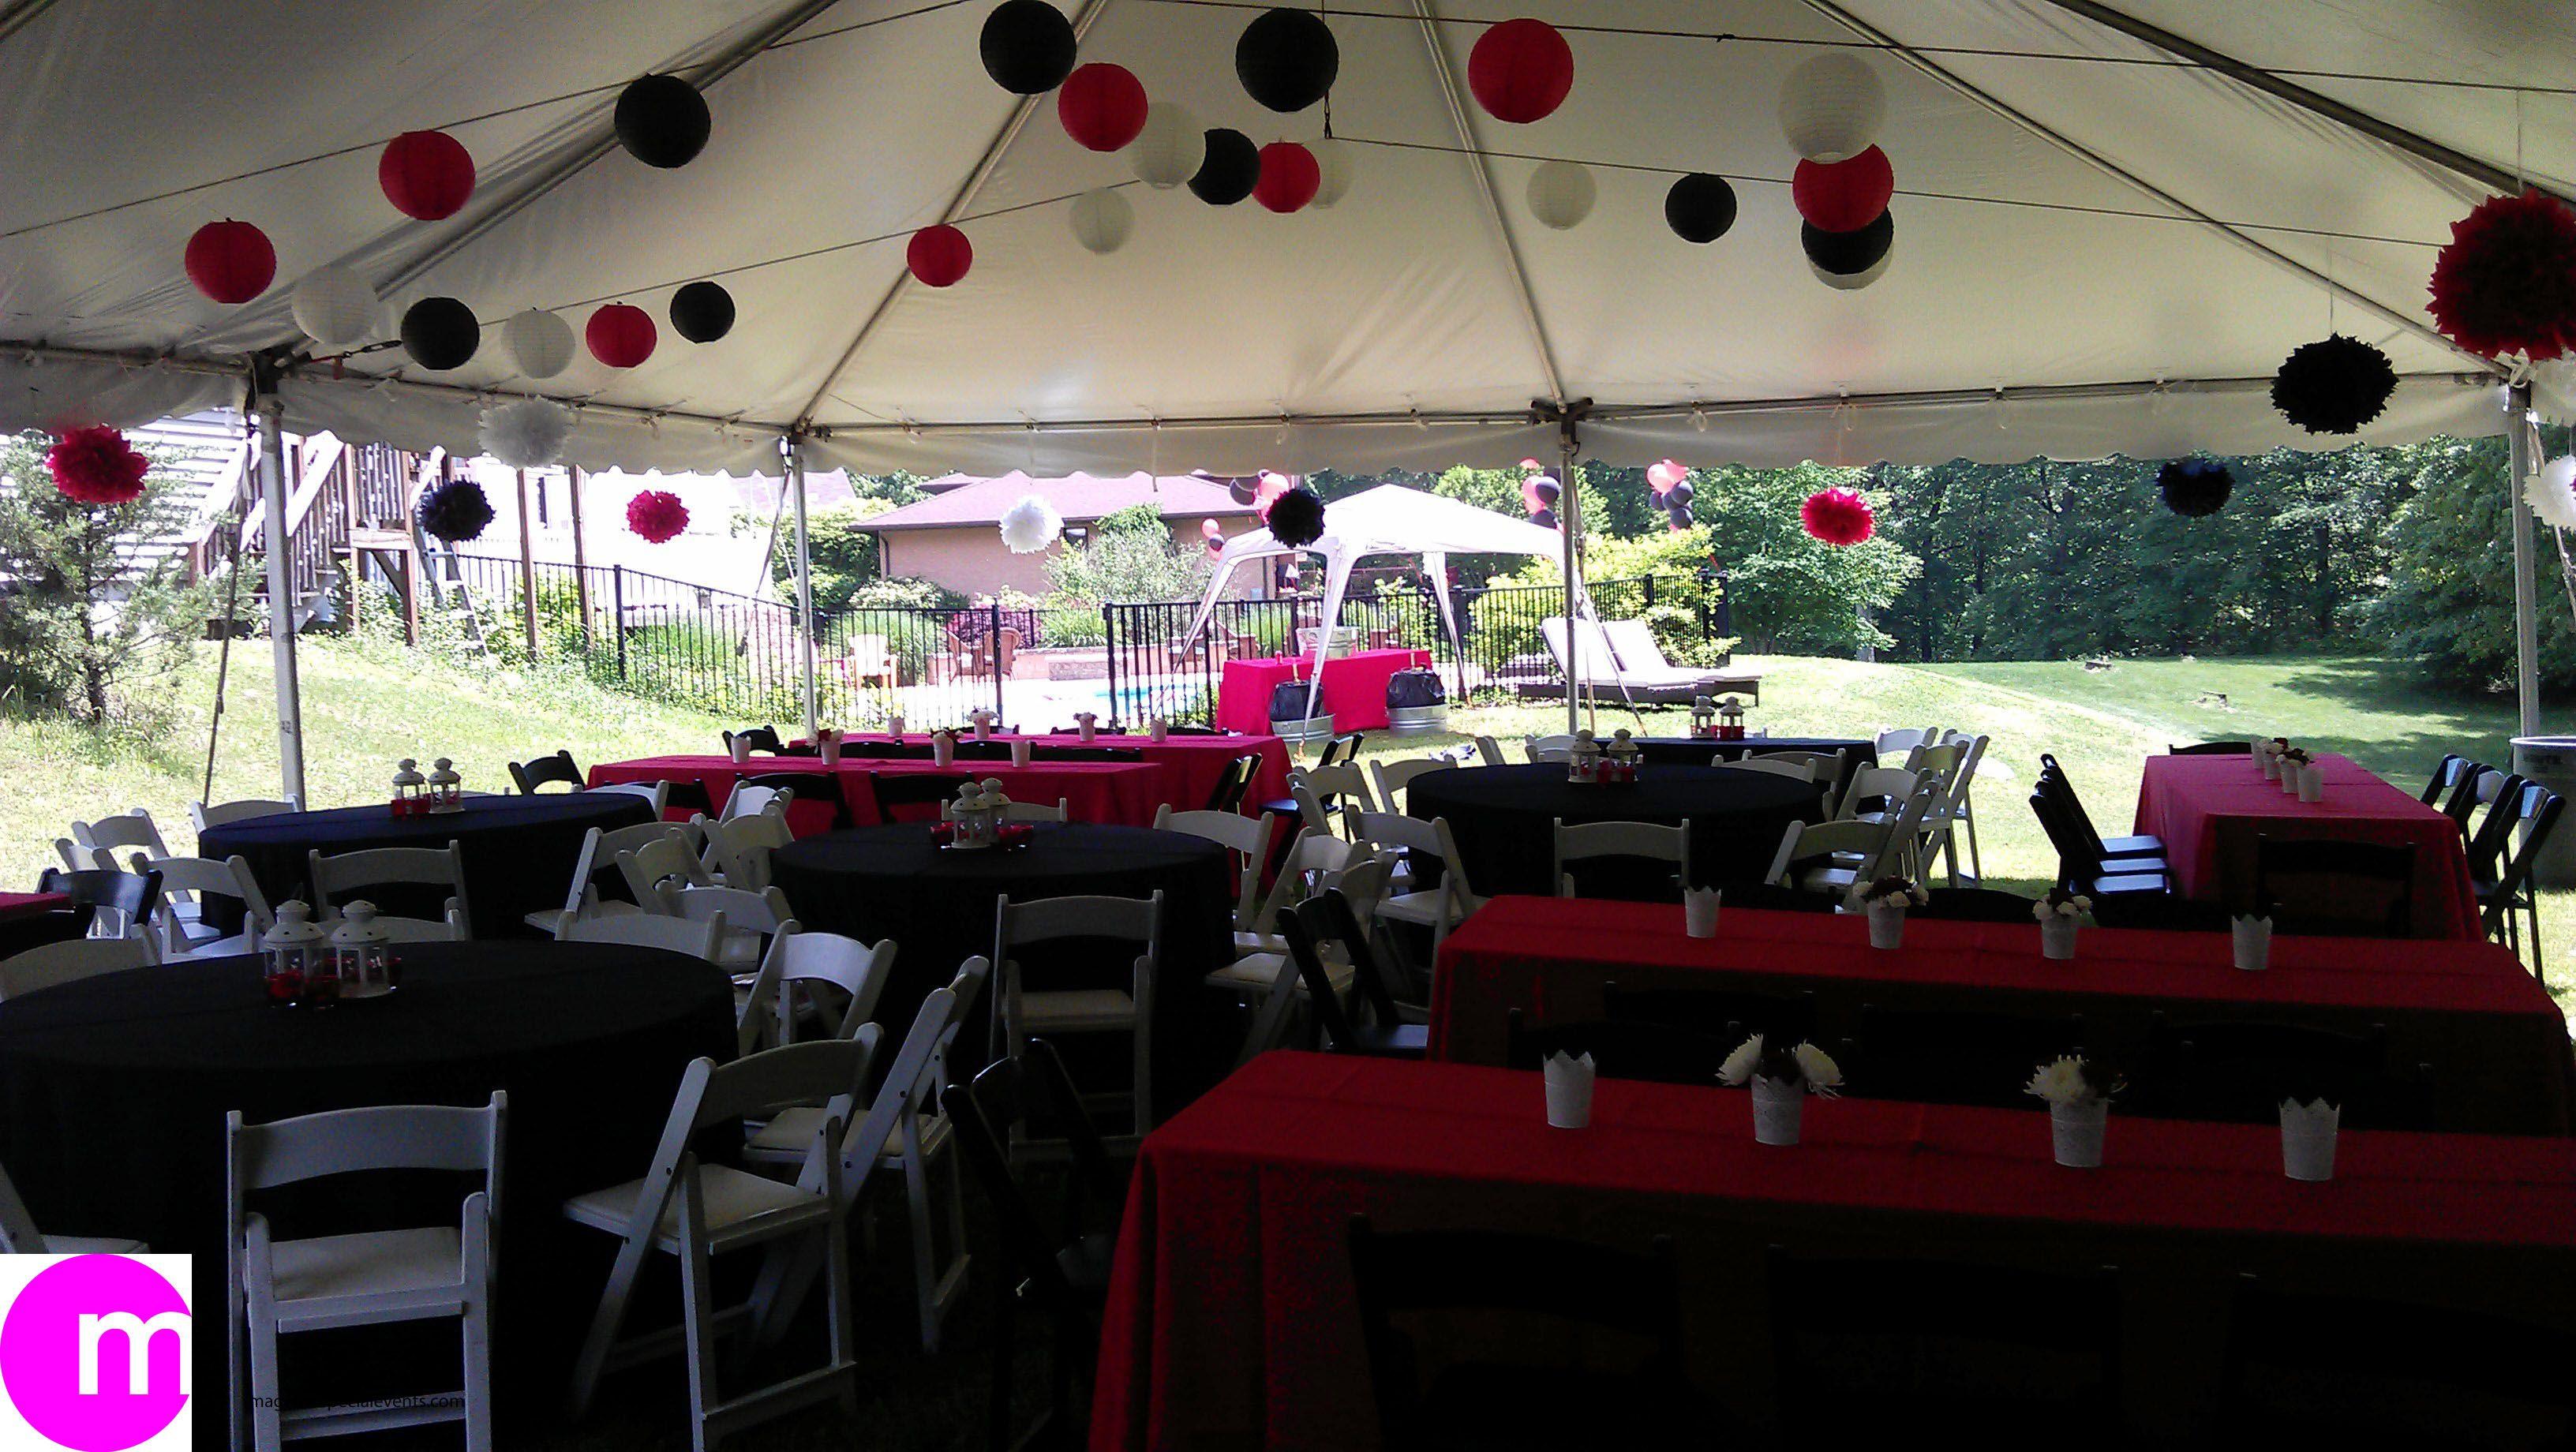 Backyard College Graduation Party Ideas  Graduation party in a backyard with tent College colors